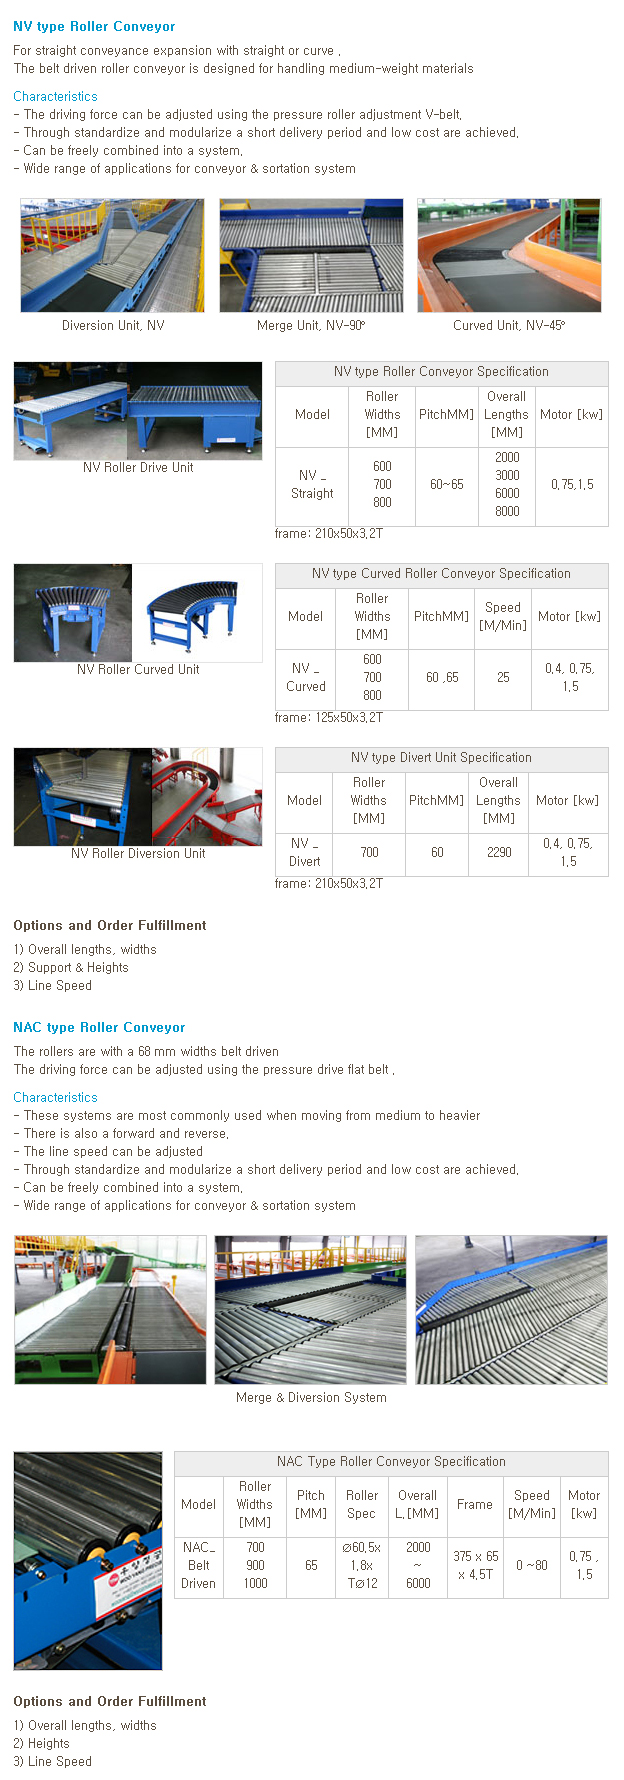 WOOYANG PRECISION Driven Roller Conveyor NV-Series, NAC_Belt Driven